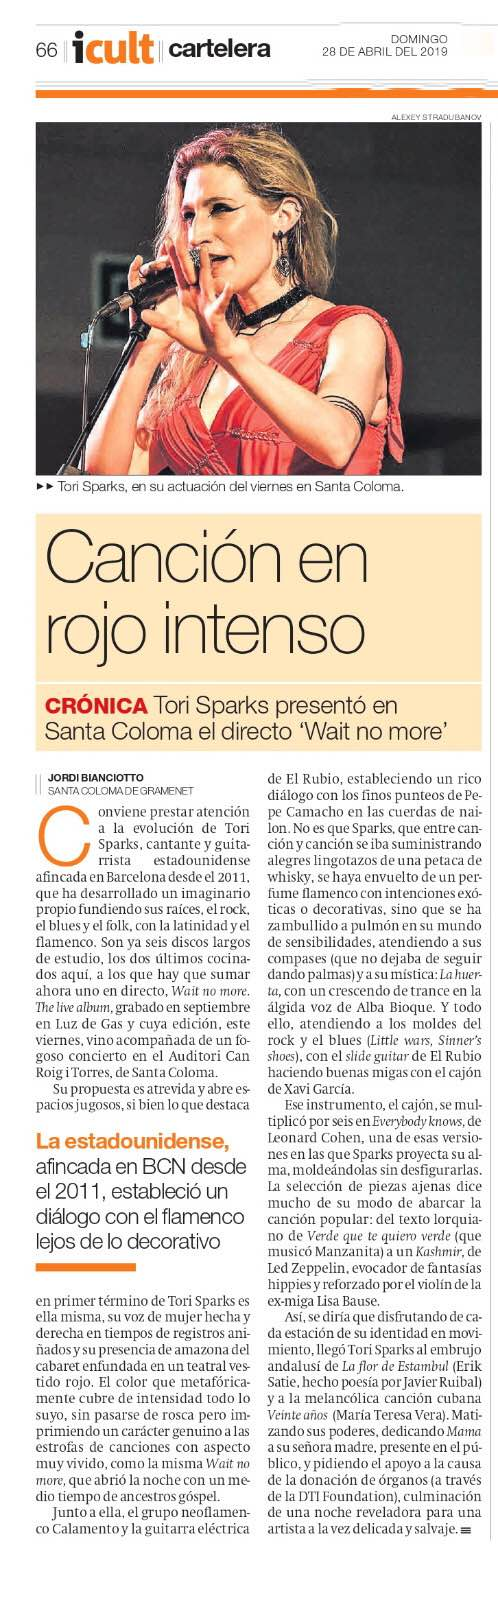 Tori Sparks El Periodico Live Concert Review Jordi Bianciotto Wait No More